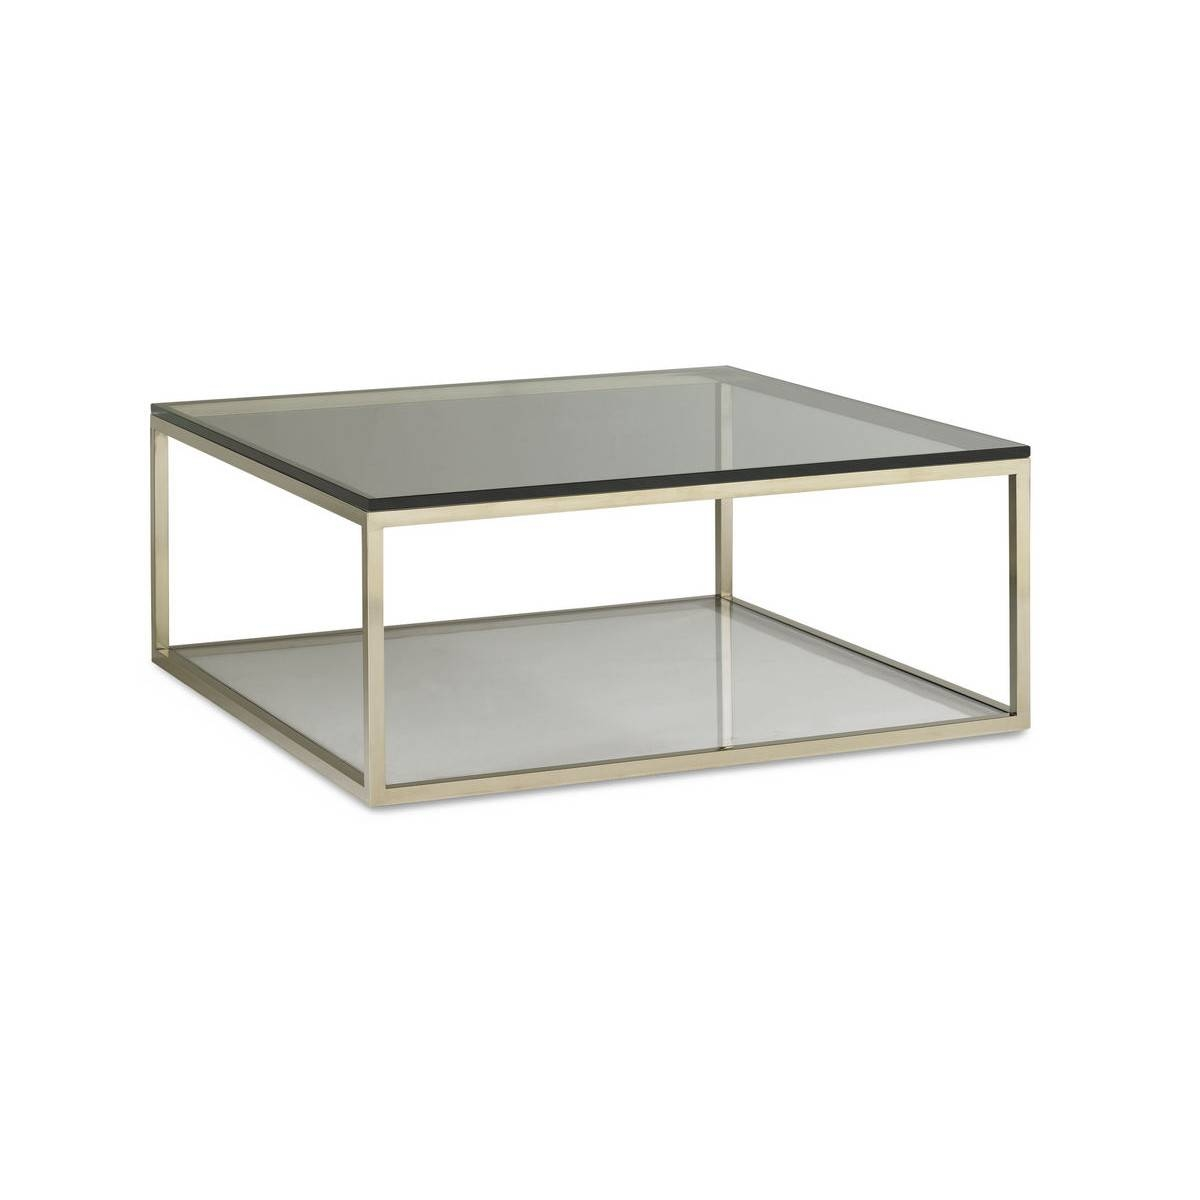 Square Glass Coffee Tables - Jericho Mafjar Project intended for Glass Square Coffee Tables (Image 27 of 30)